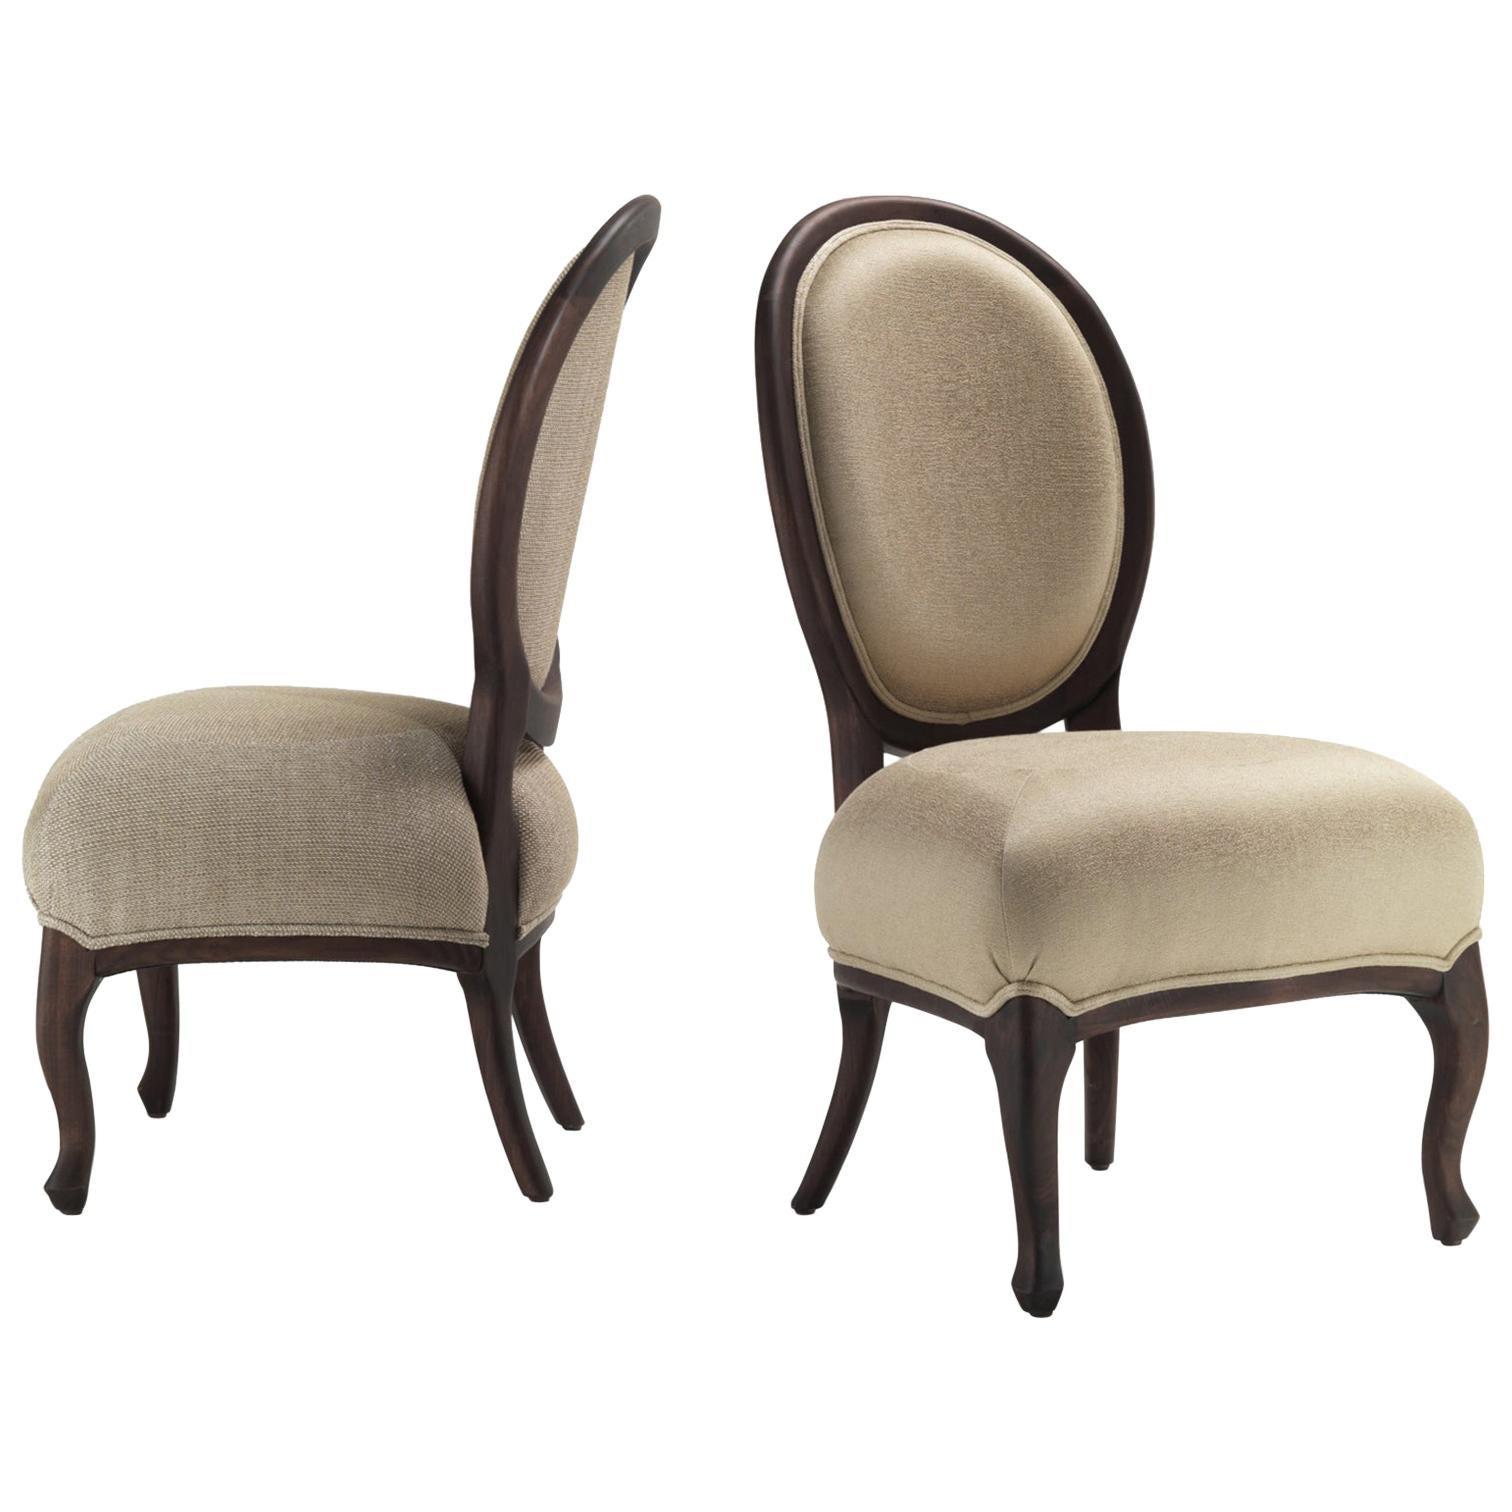 Rubens/P Dining Chair